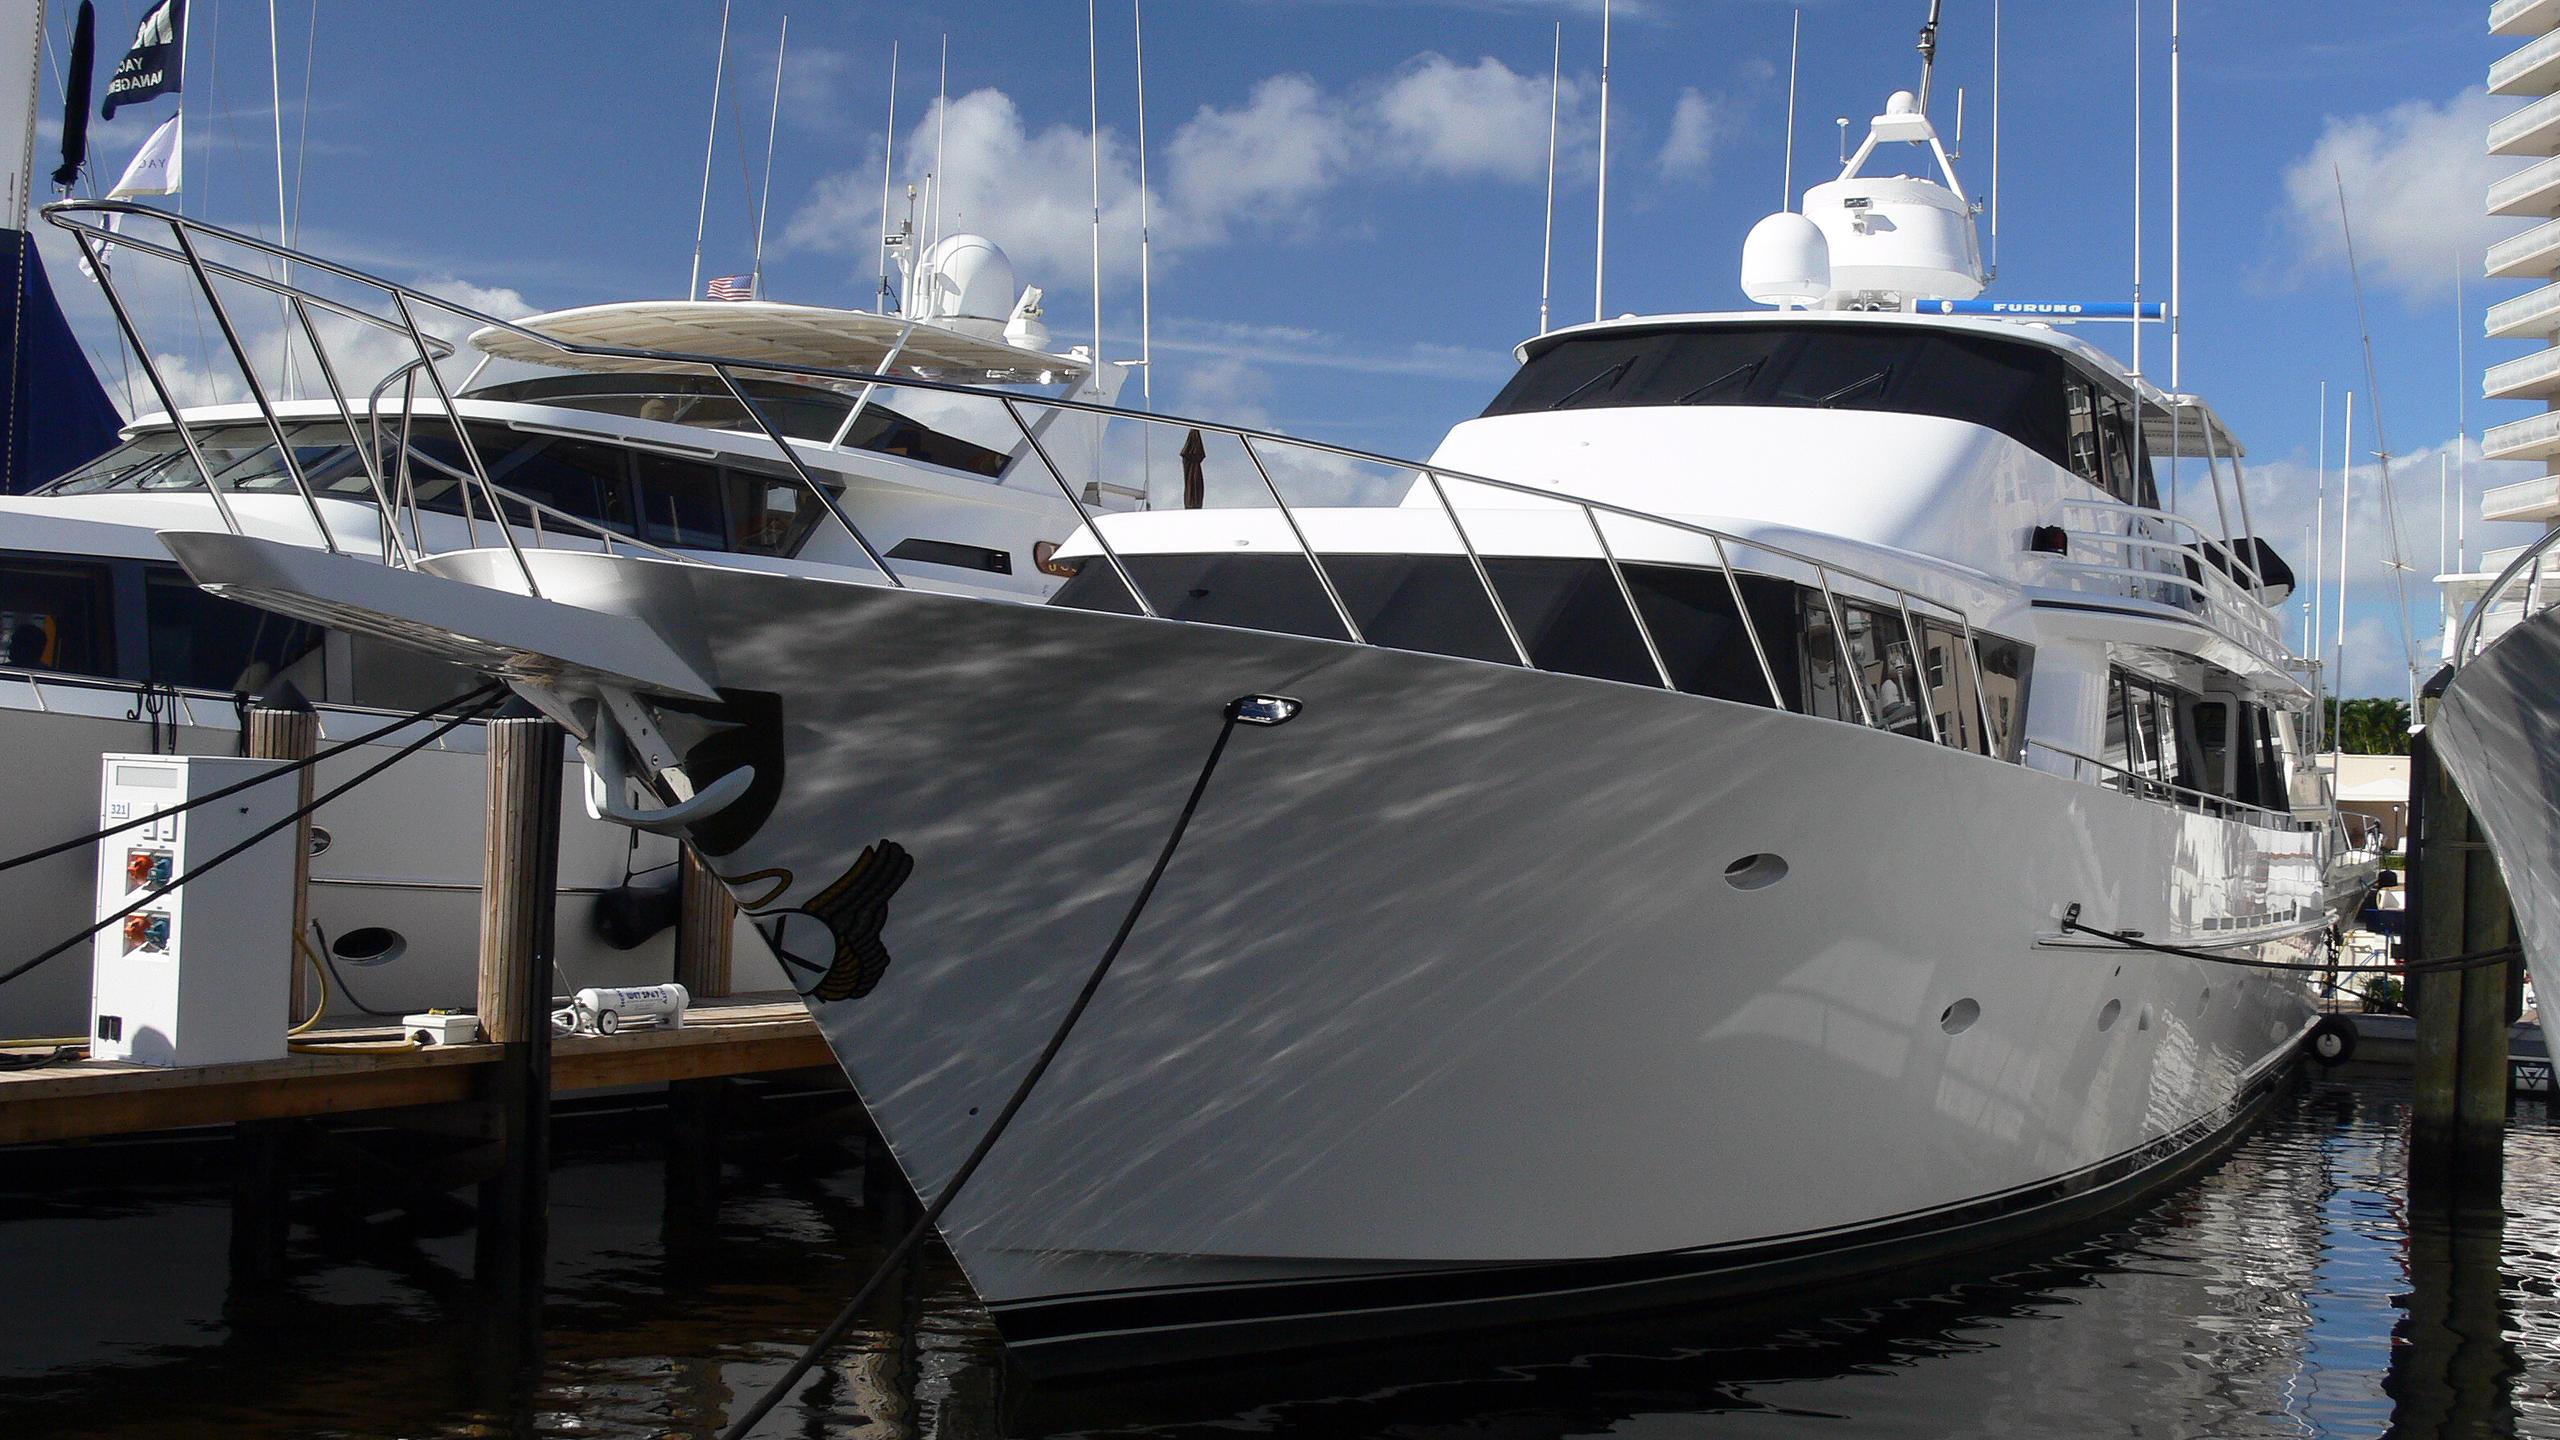 dauntless-motor-yacht-eagle-1995-31m-front